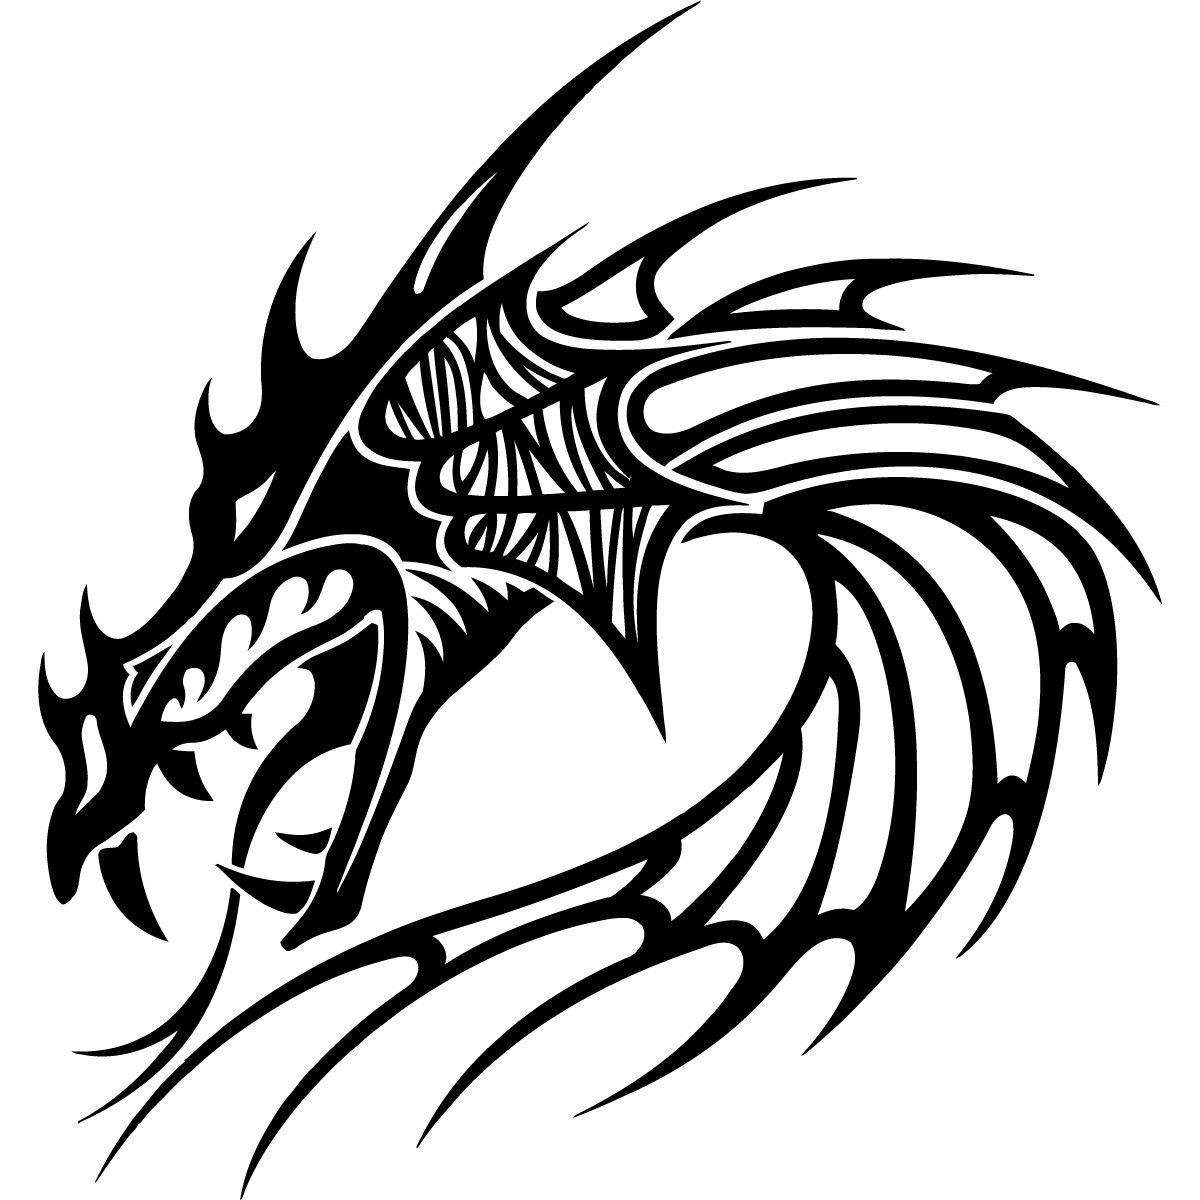 Cabezas De Dragones Para Tatuar pin de patricia iannone en siluetas - dragones | tatuajes